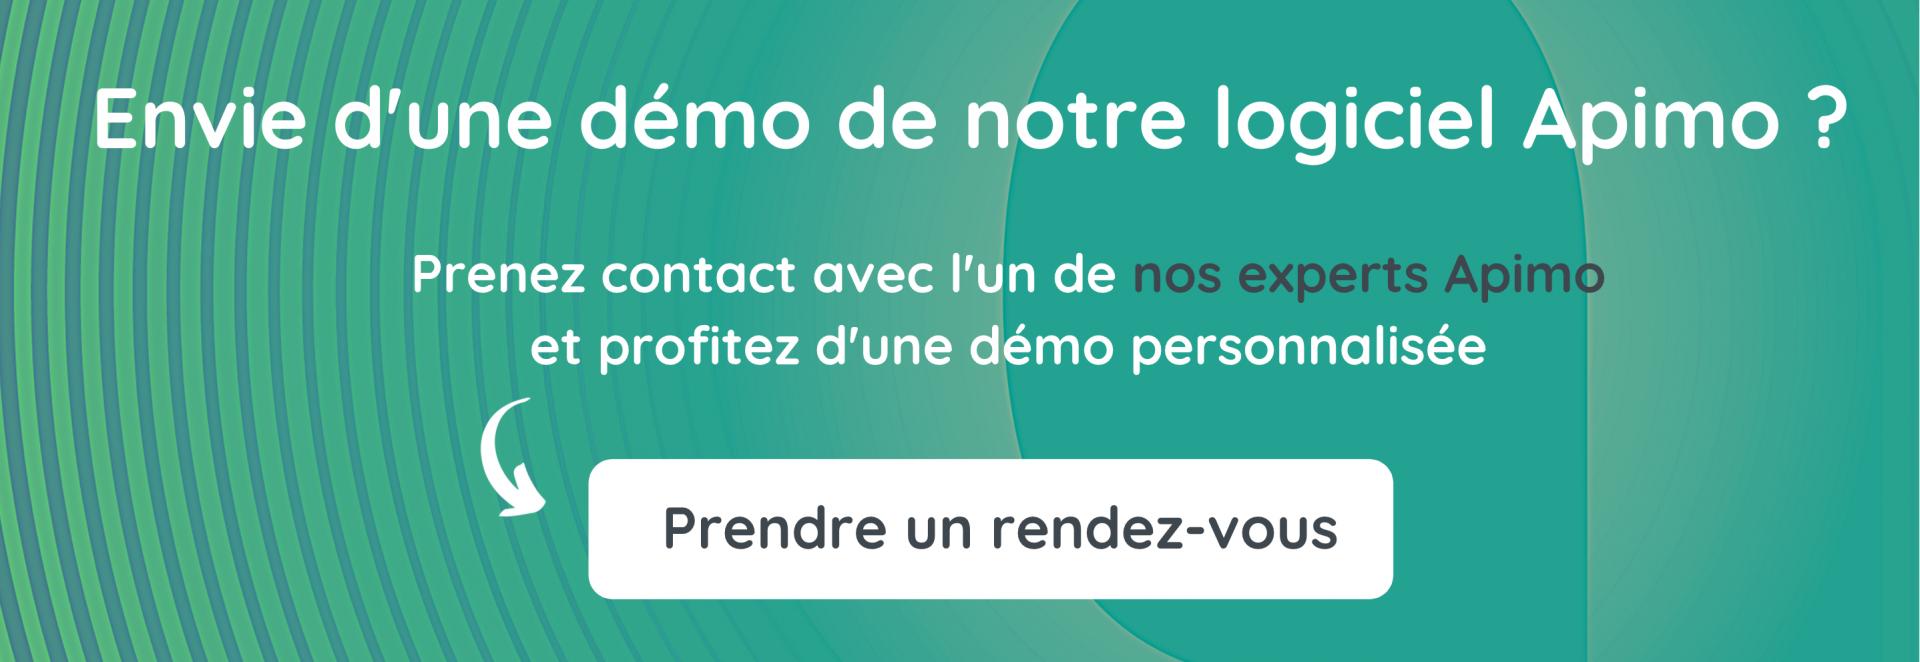 cta-demo-logiciel-apimo-FR